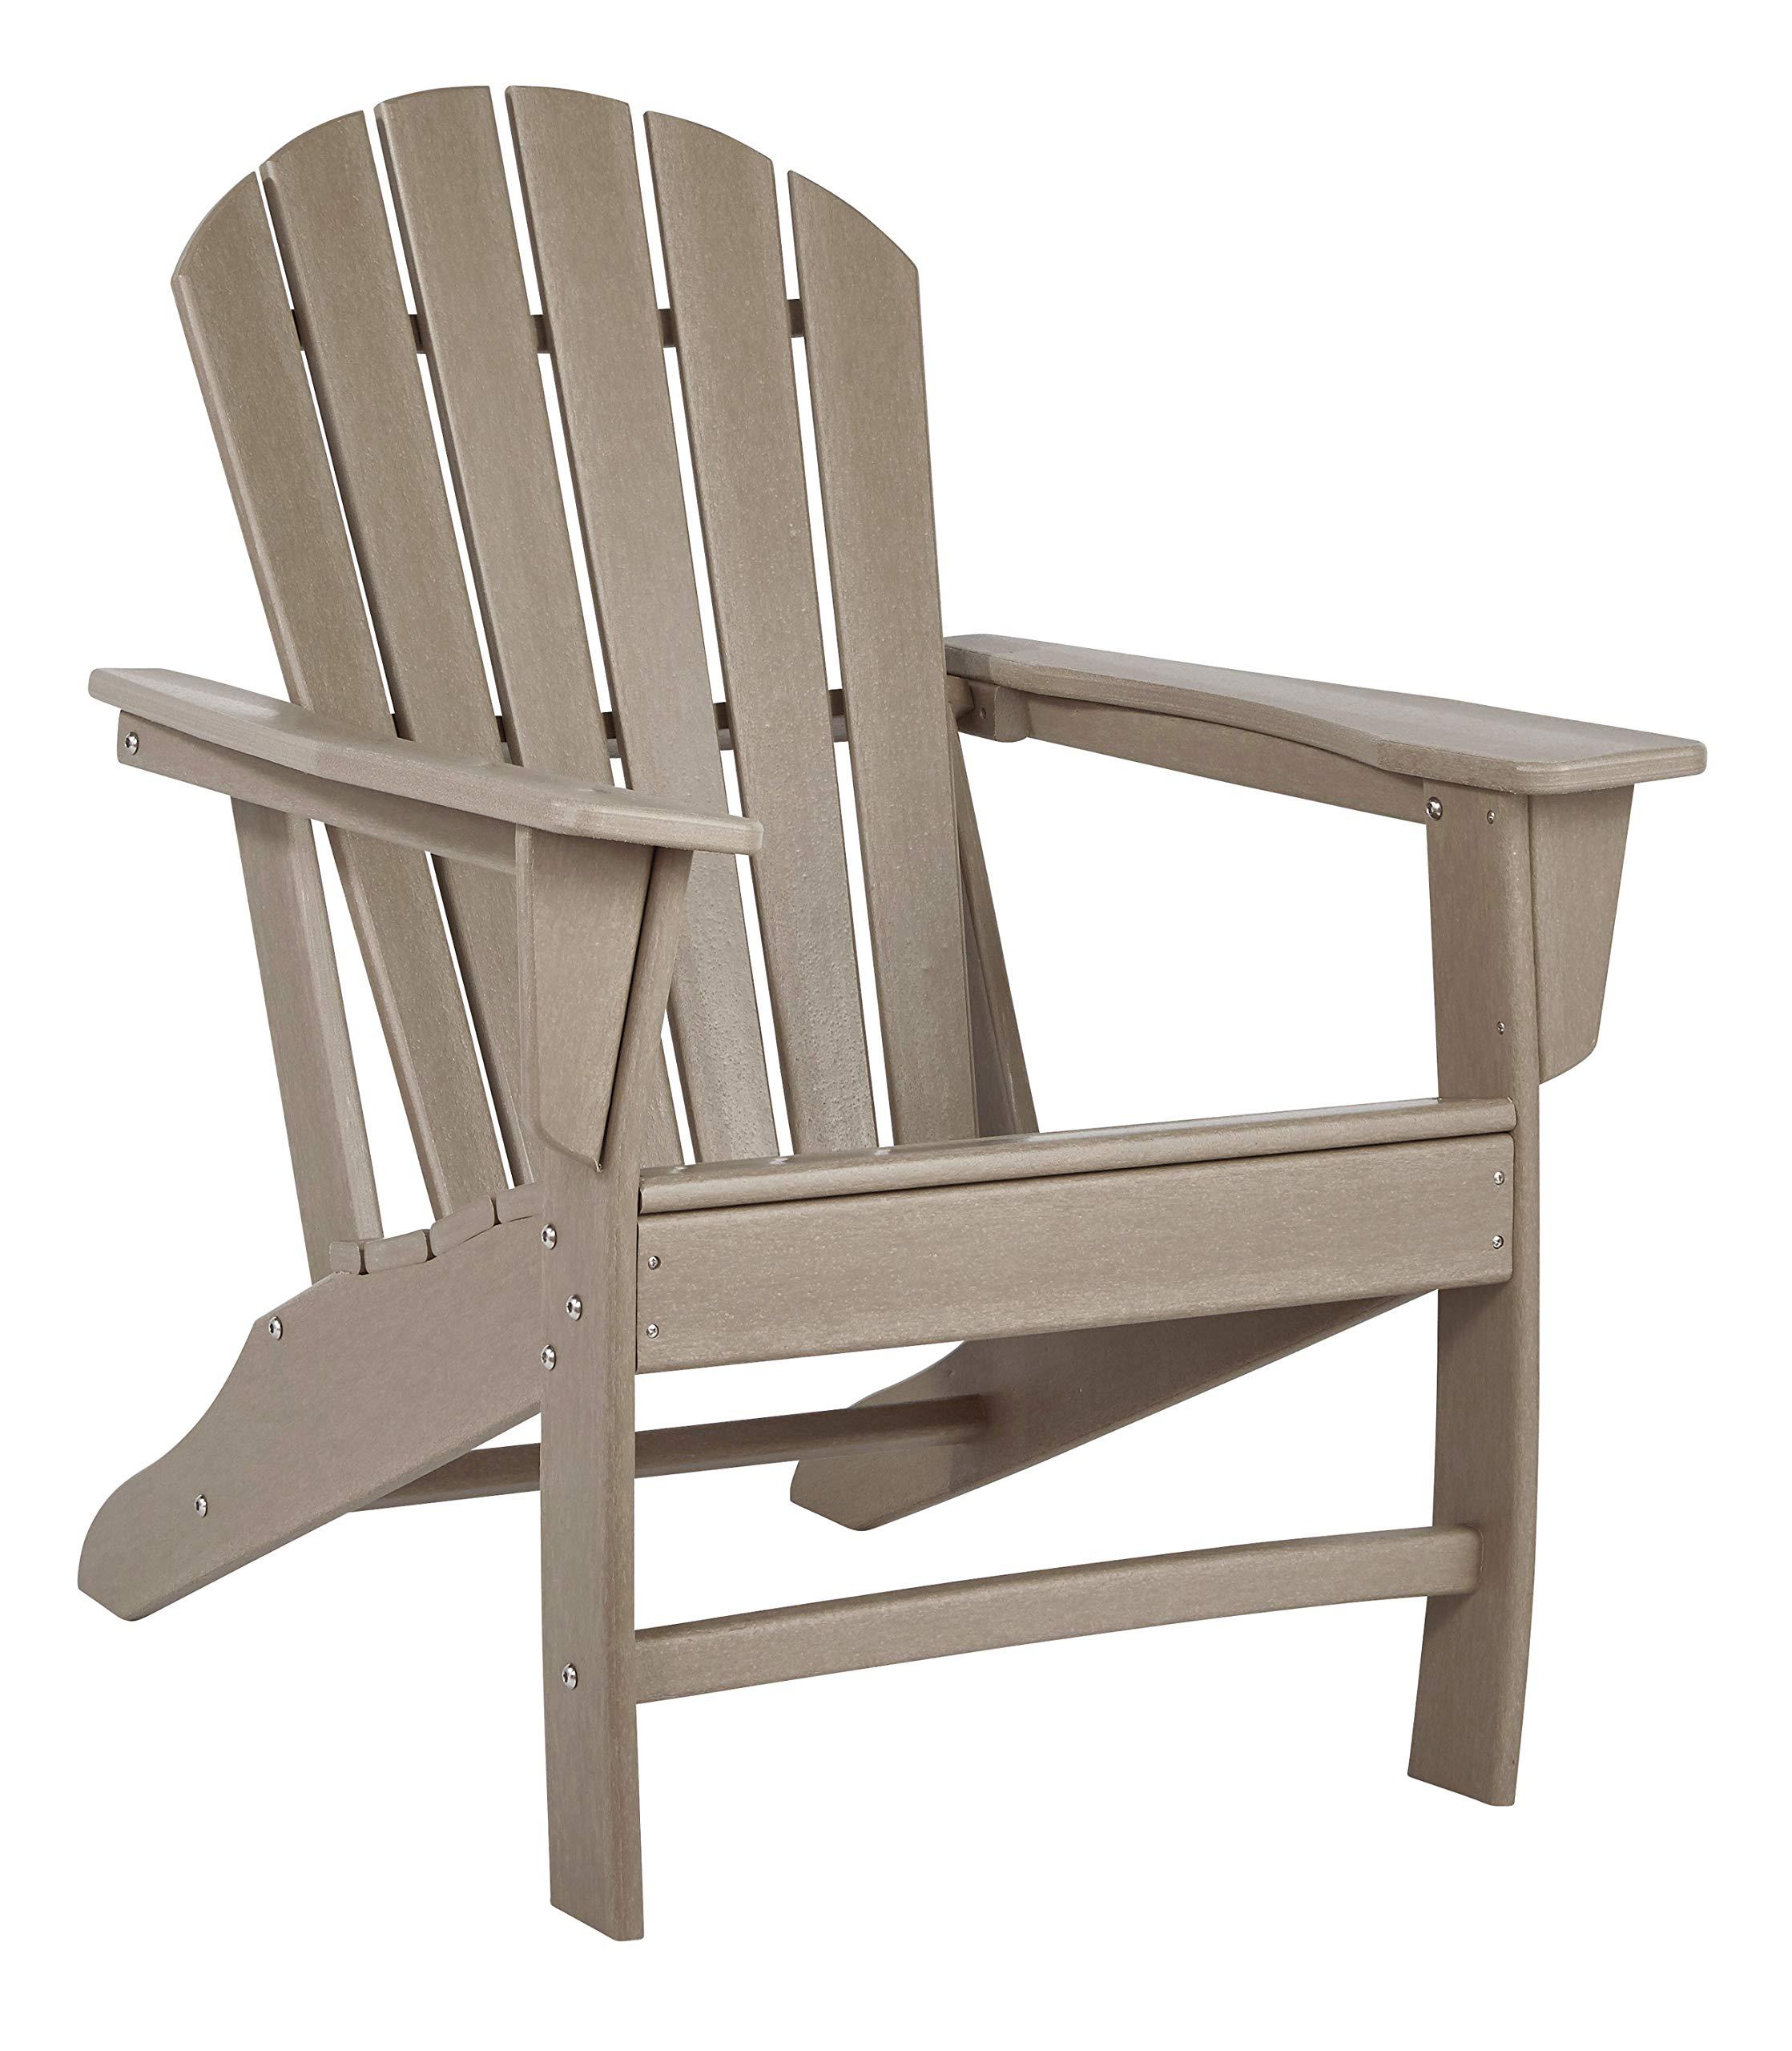 Ashley Furniture Signature Design - Sundown Treasure Outdoor Adirondack Chair - Hard Plastic - Grayish Brown by Signature Design by Ashley